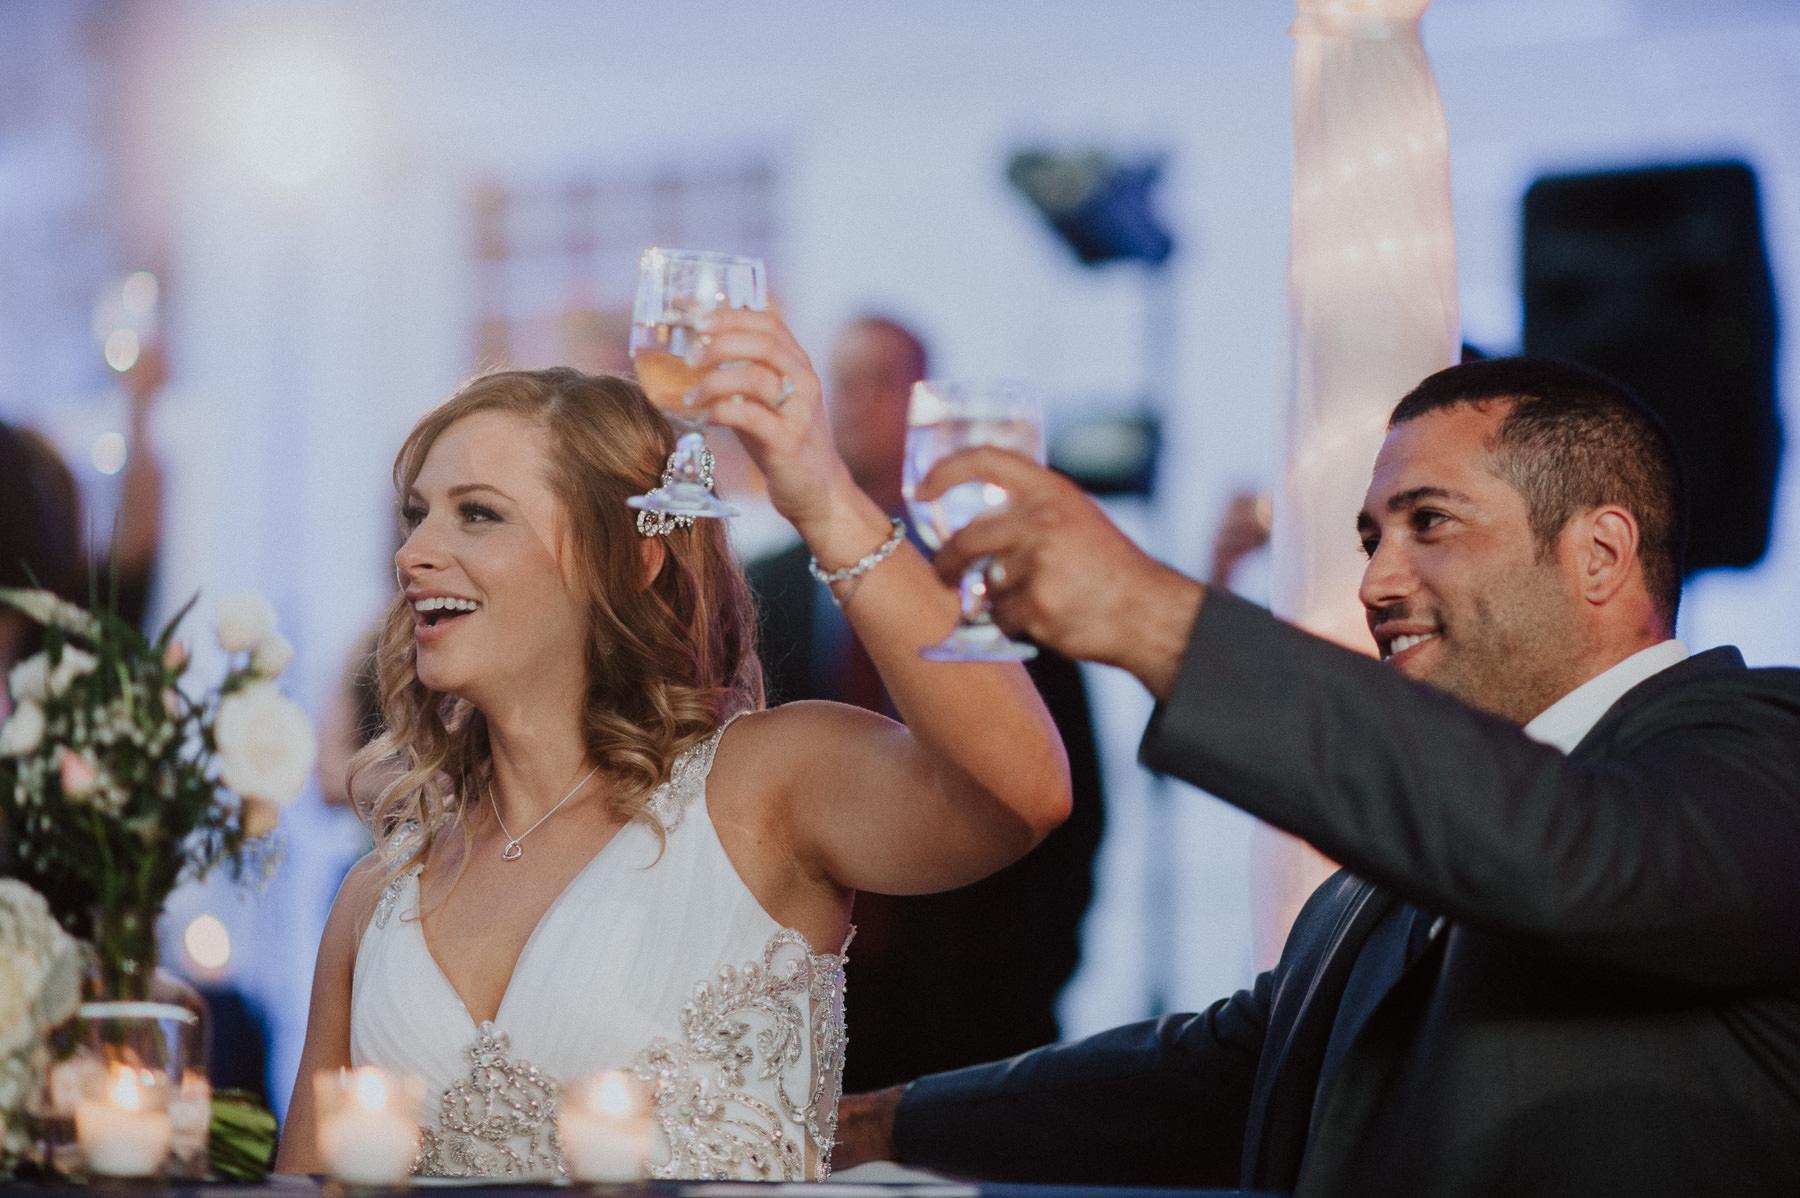 appleford-estate-wedding-photography-86.jpg